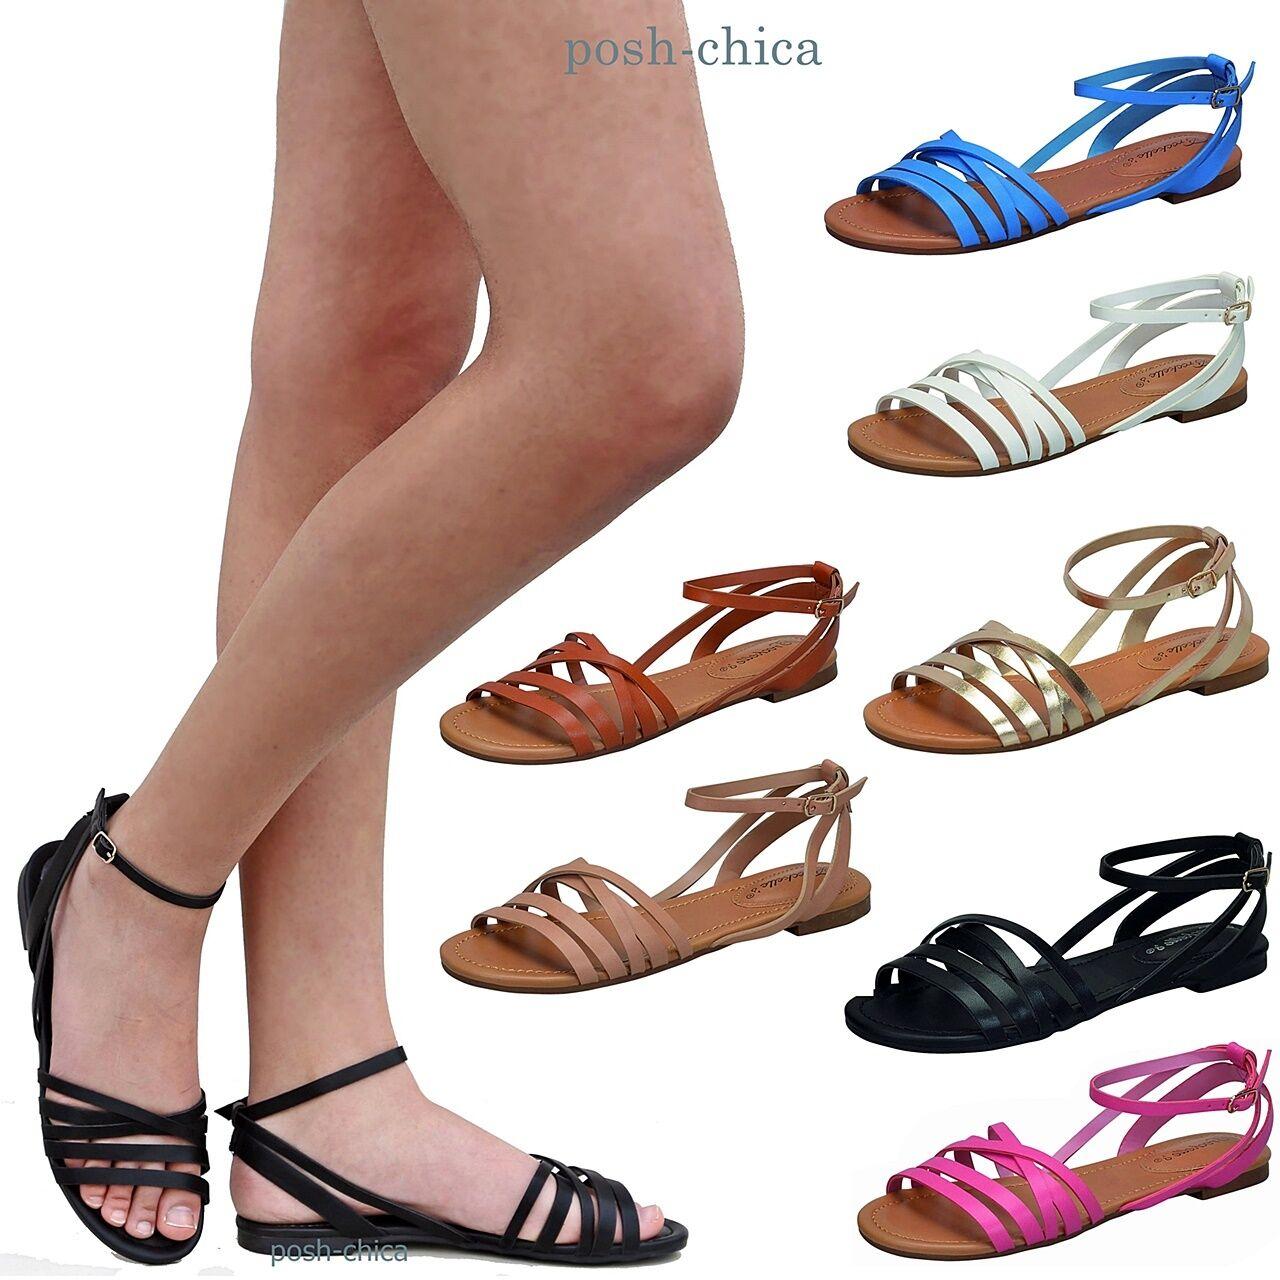 New Women Oin21 Black Tan Flat Beige Strappy Ankle Strap Flat Tan Sandals size 5.5-11 221ab3